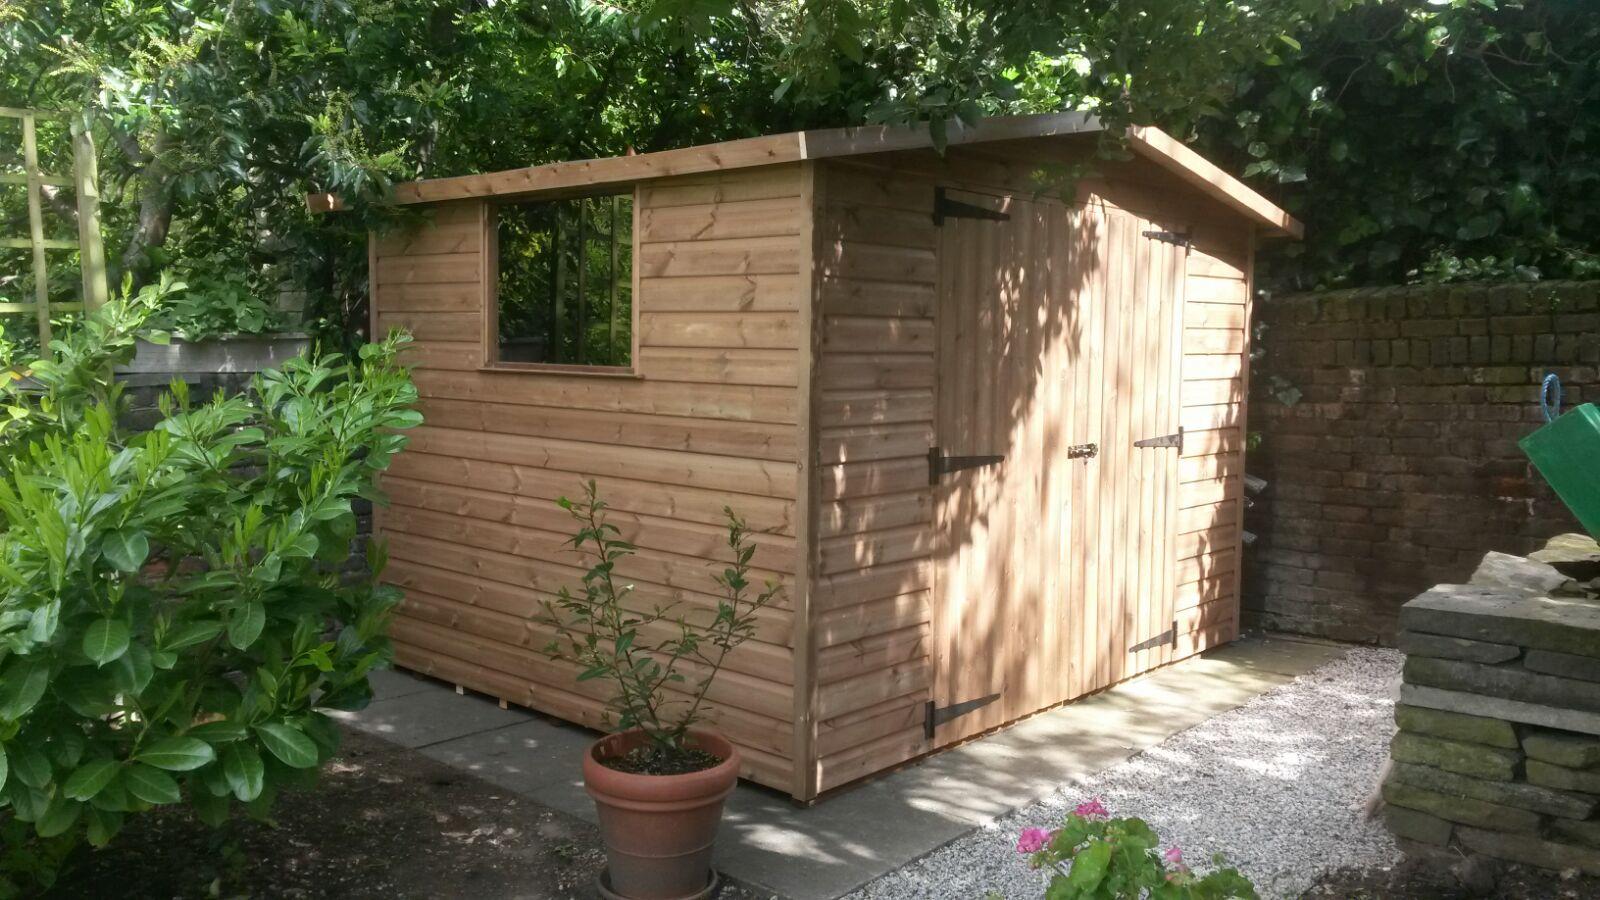 6 x 8 Garden apex shed